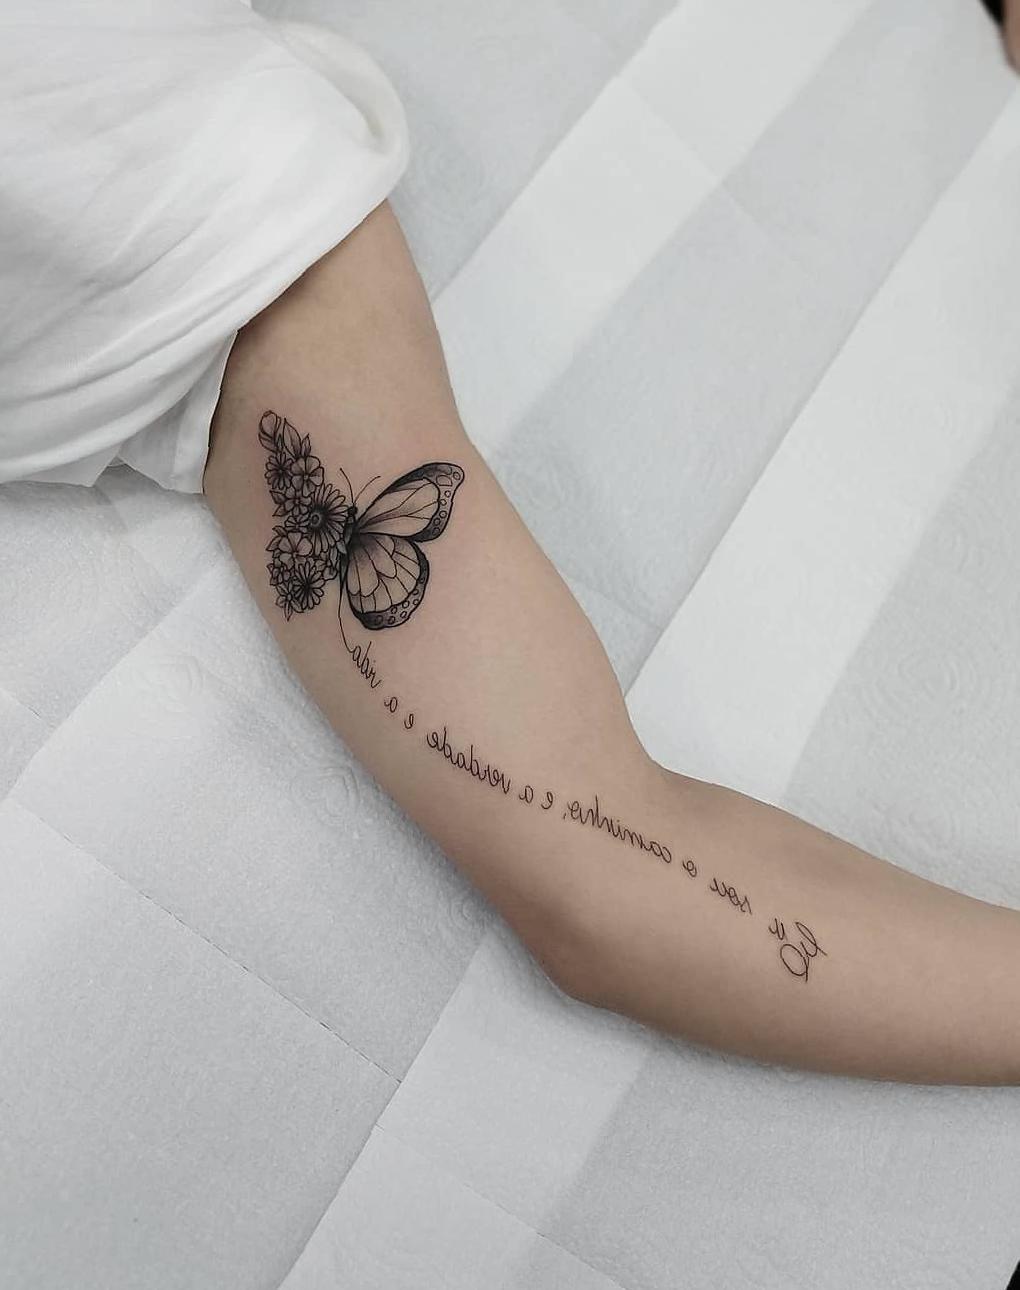 35 Inspiring Arm Tattoo Design Ideas for Women 2020 in